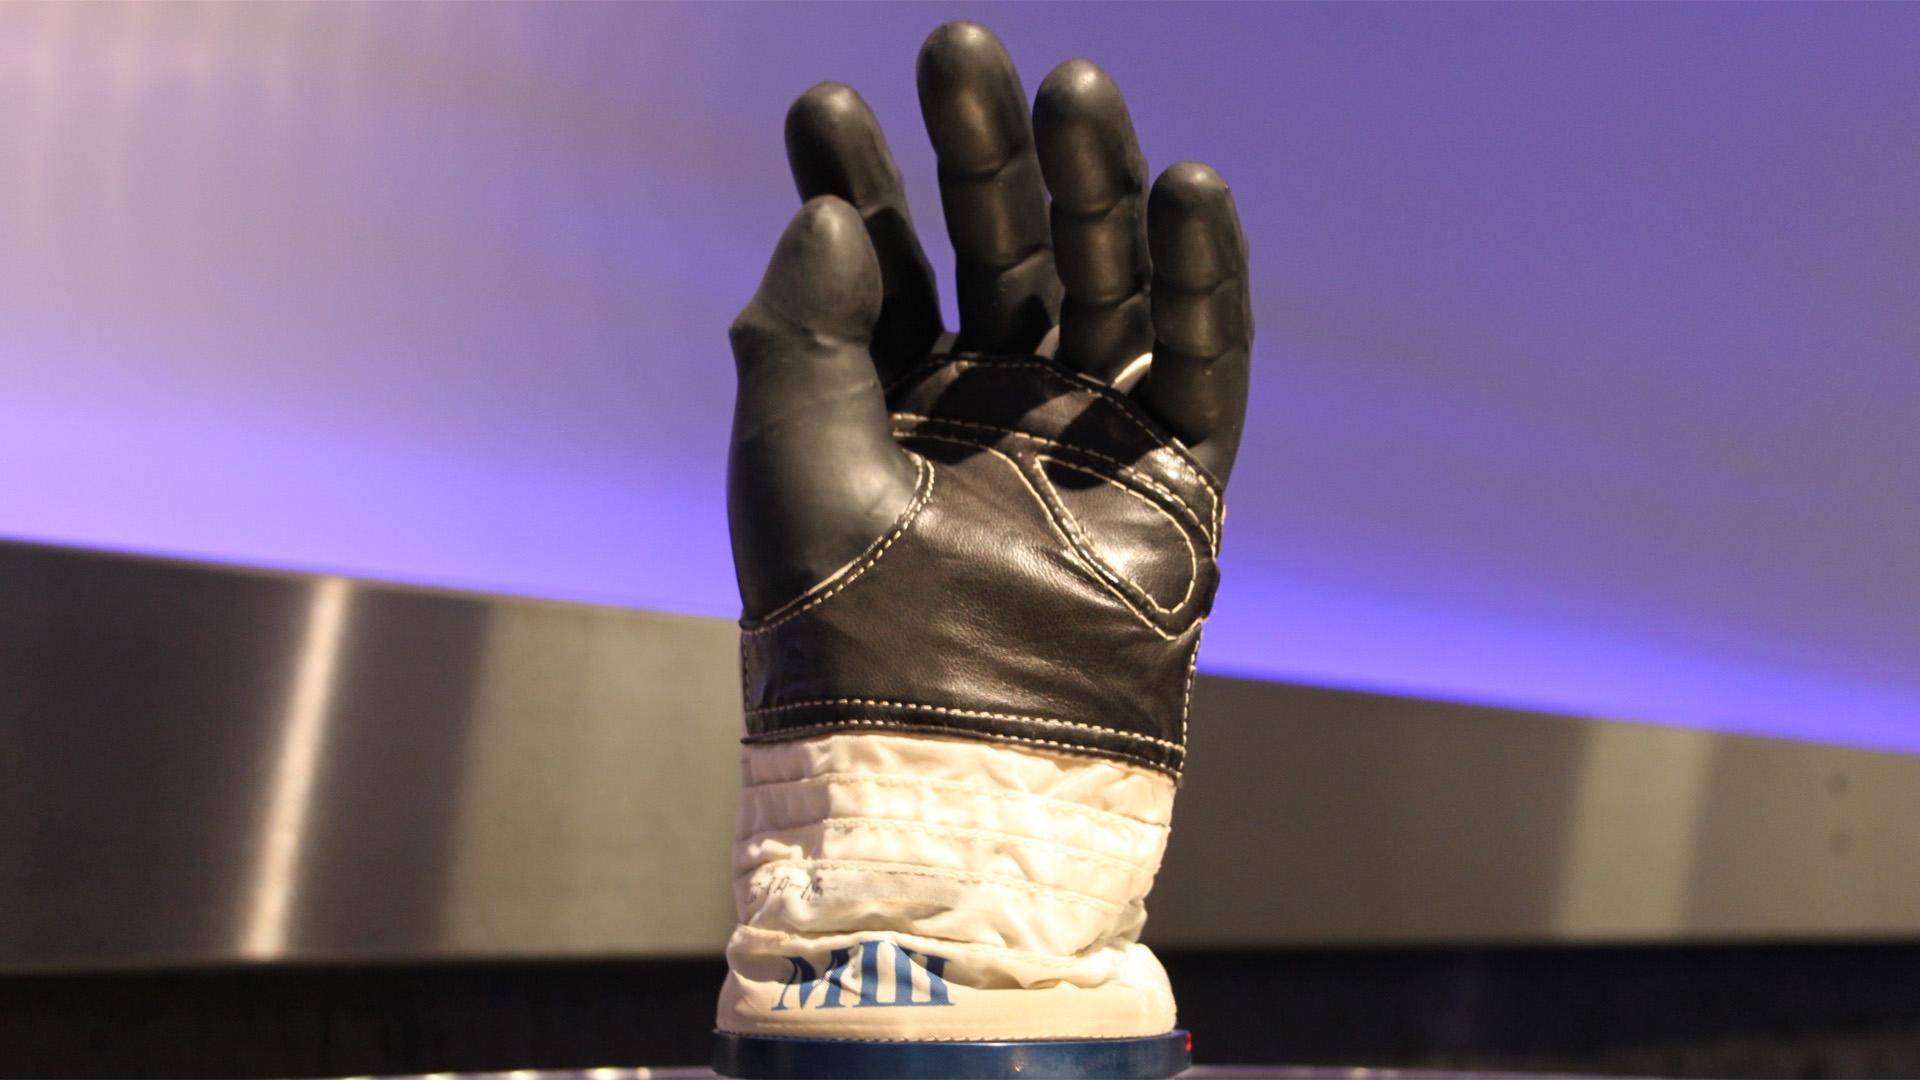 Weltall-Woche Tag 1: Der Astronautenhandschuh